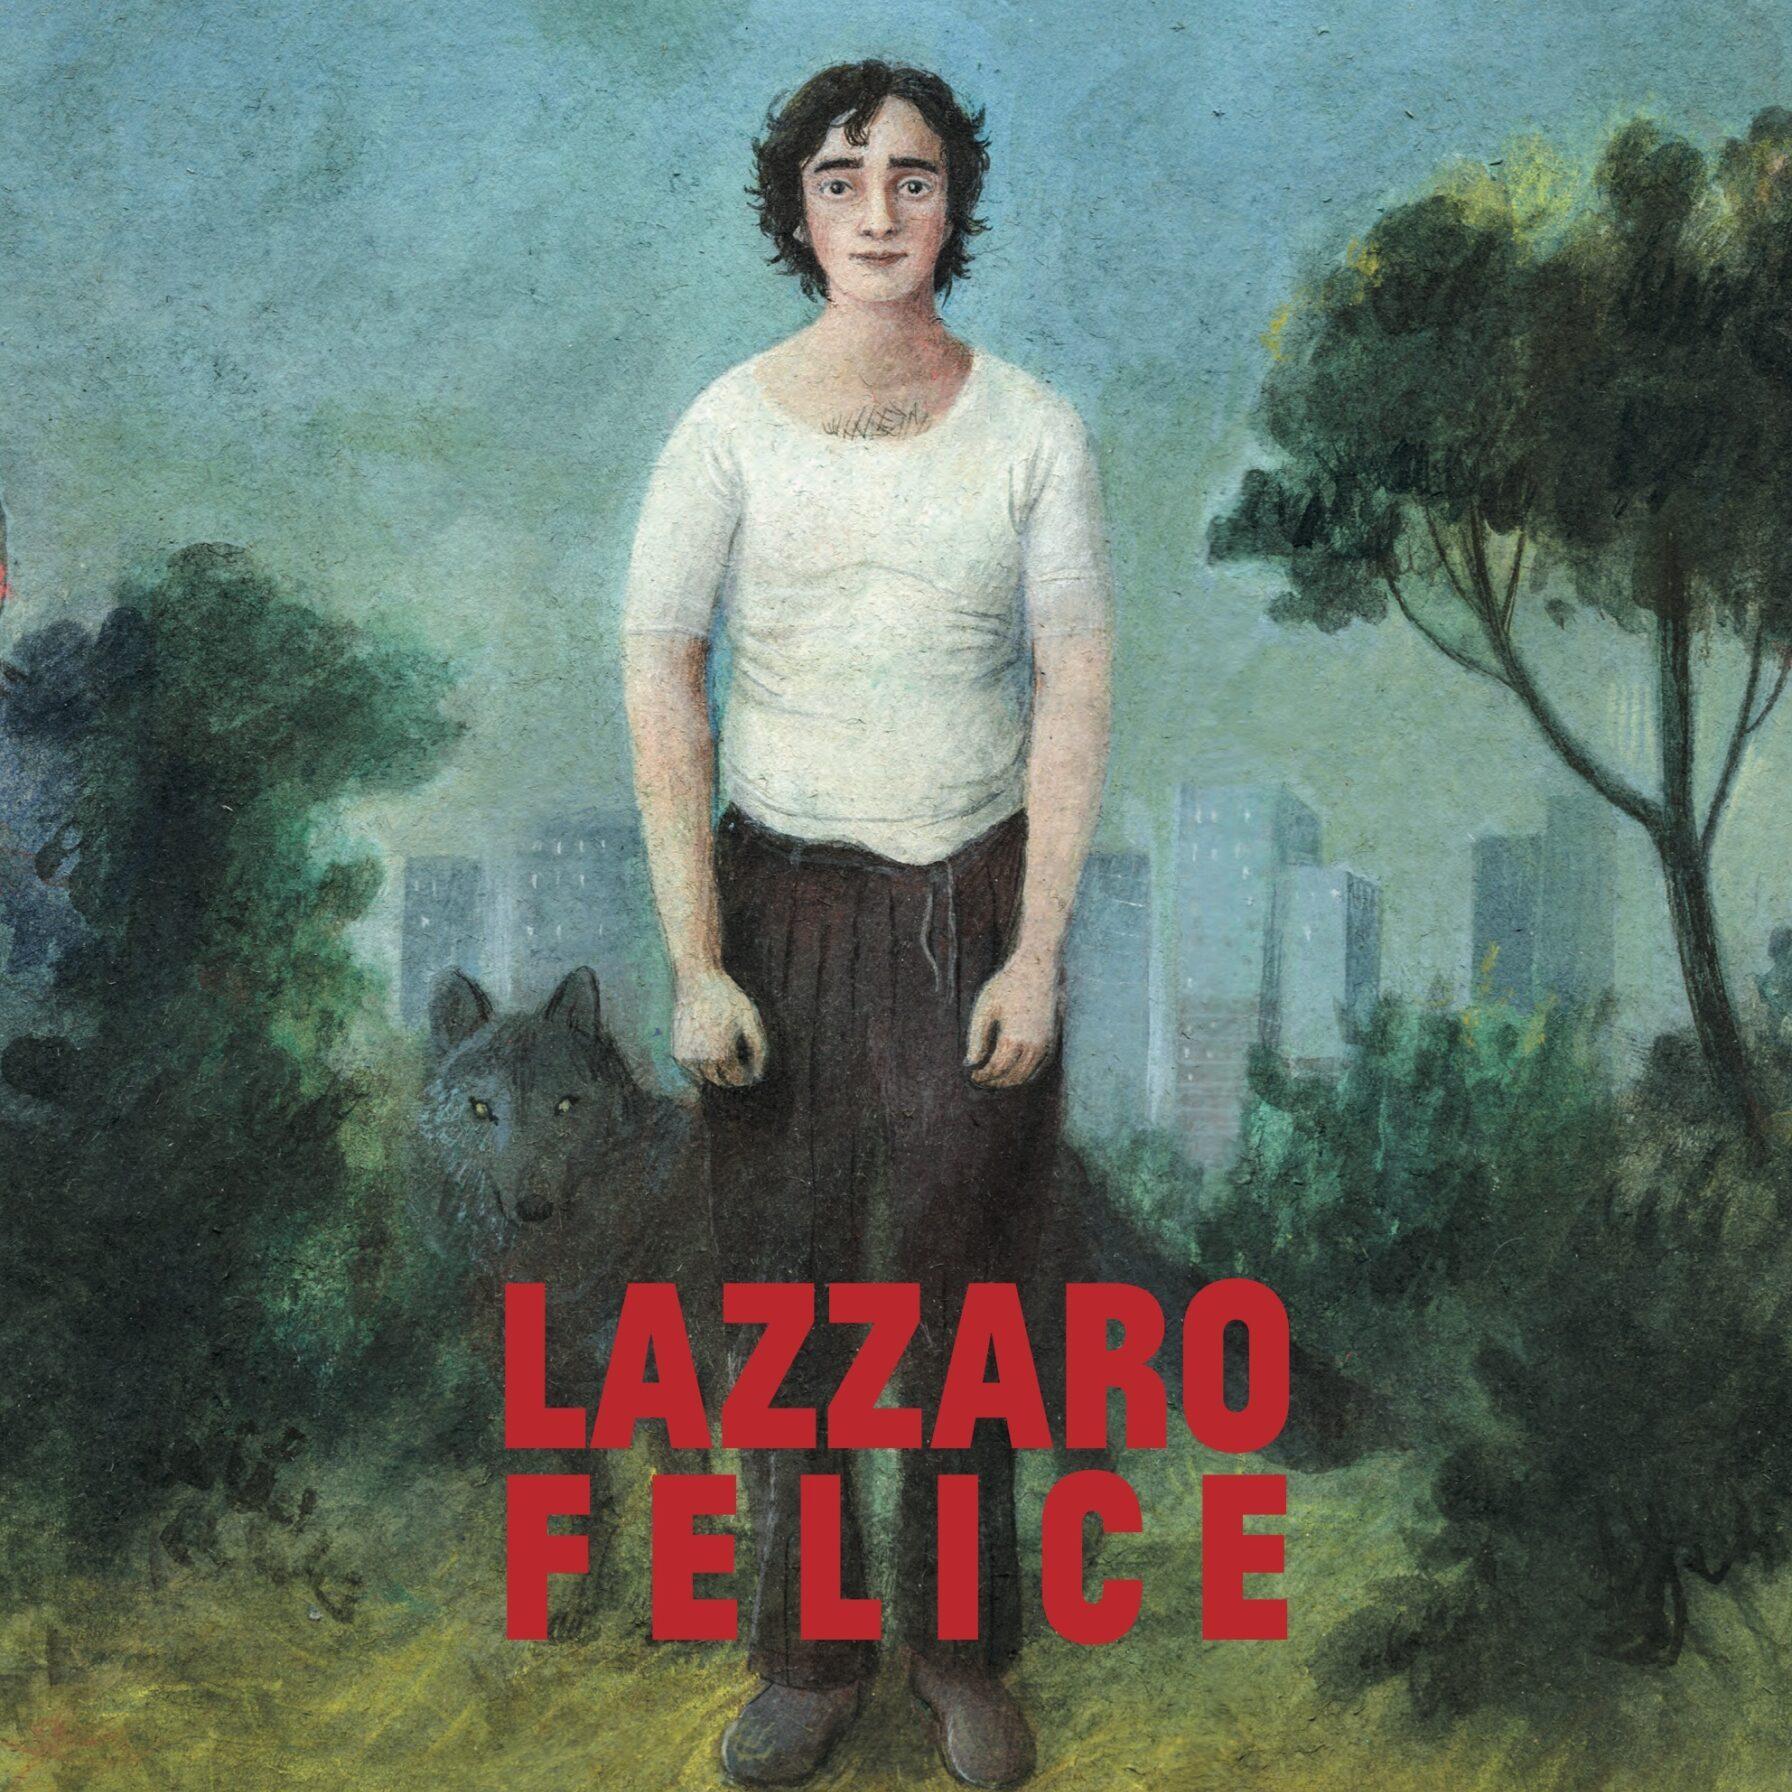 Locandina del film Lazzaro Felice